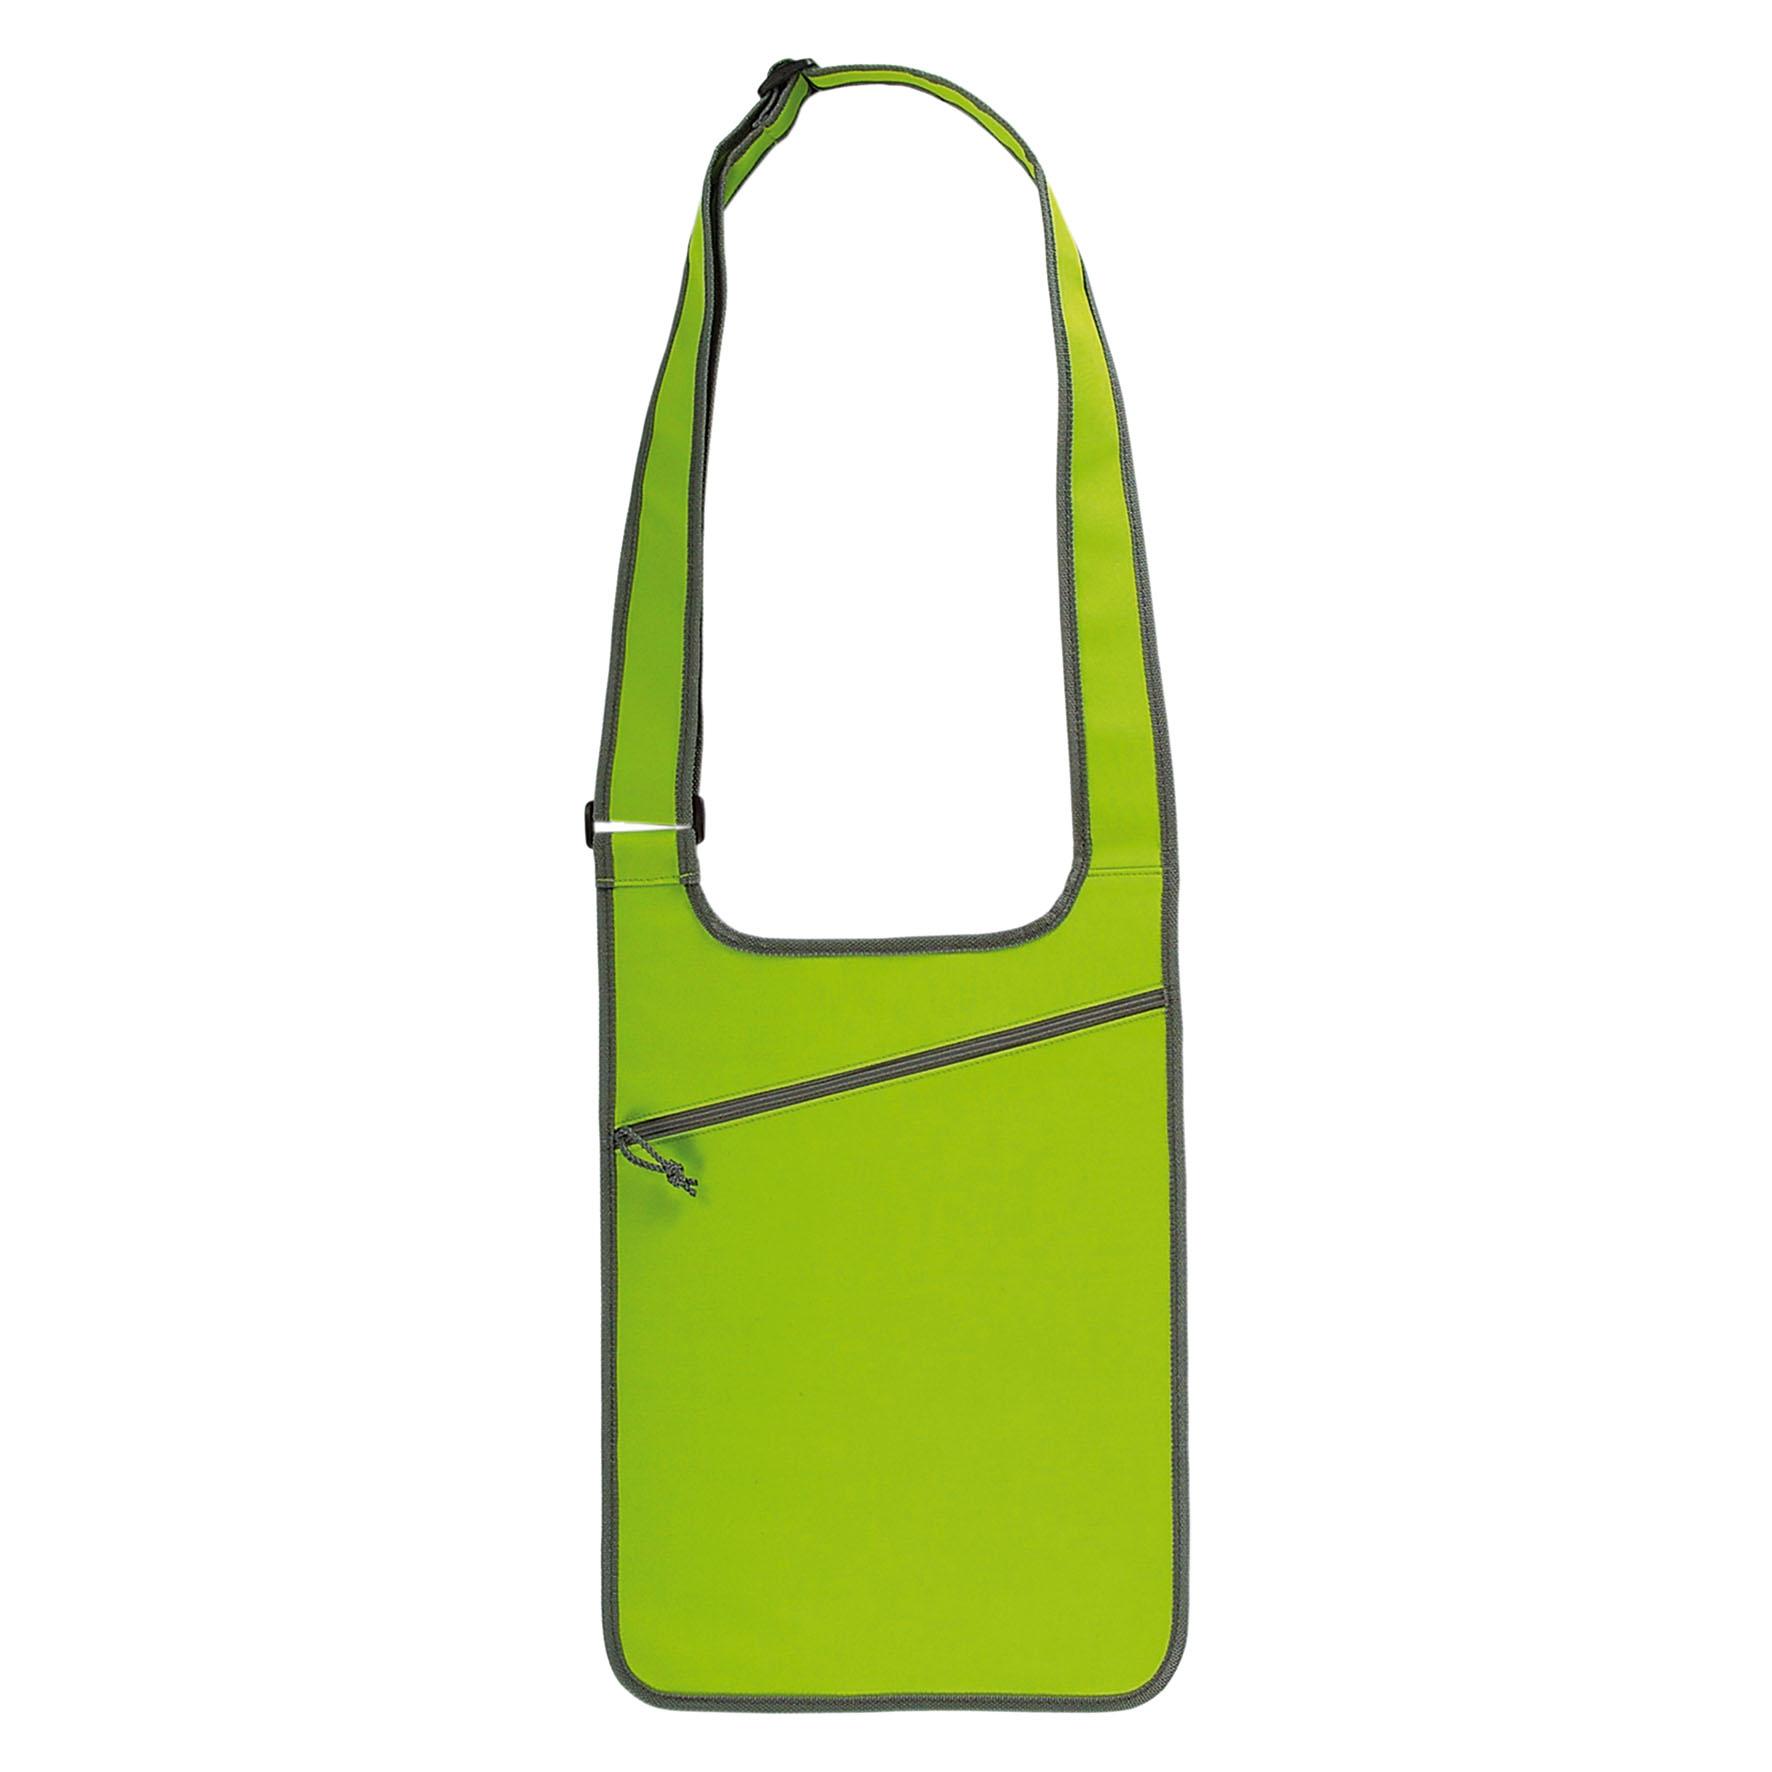 Sacoche publicitaire Luka - Sacoche personnalisable - vert